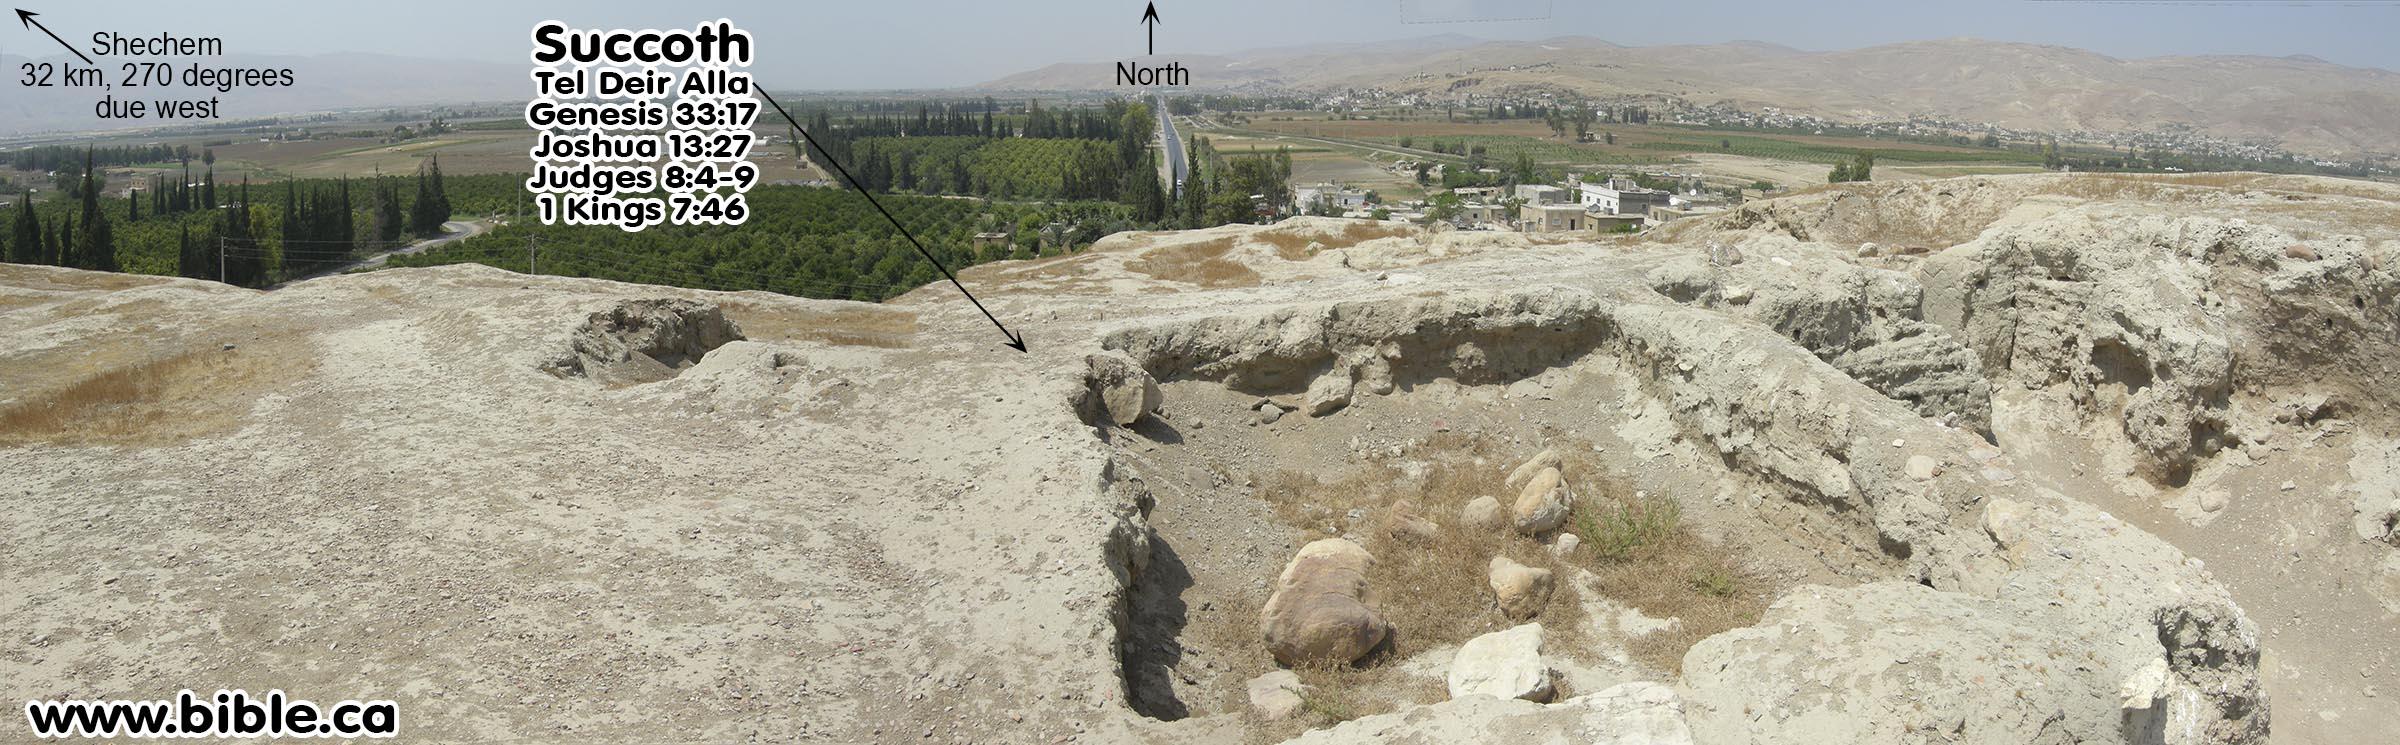 https://www.bible.ca/archeology/panorama-israel-archeology-succoth-deir-alla-balaam-th.jpg